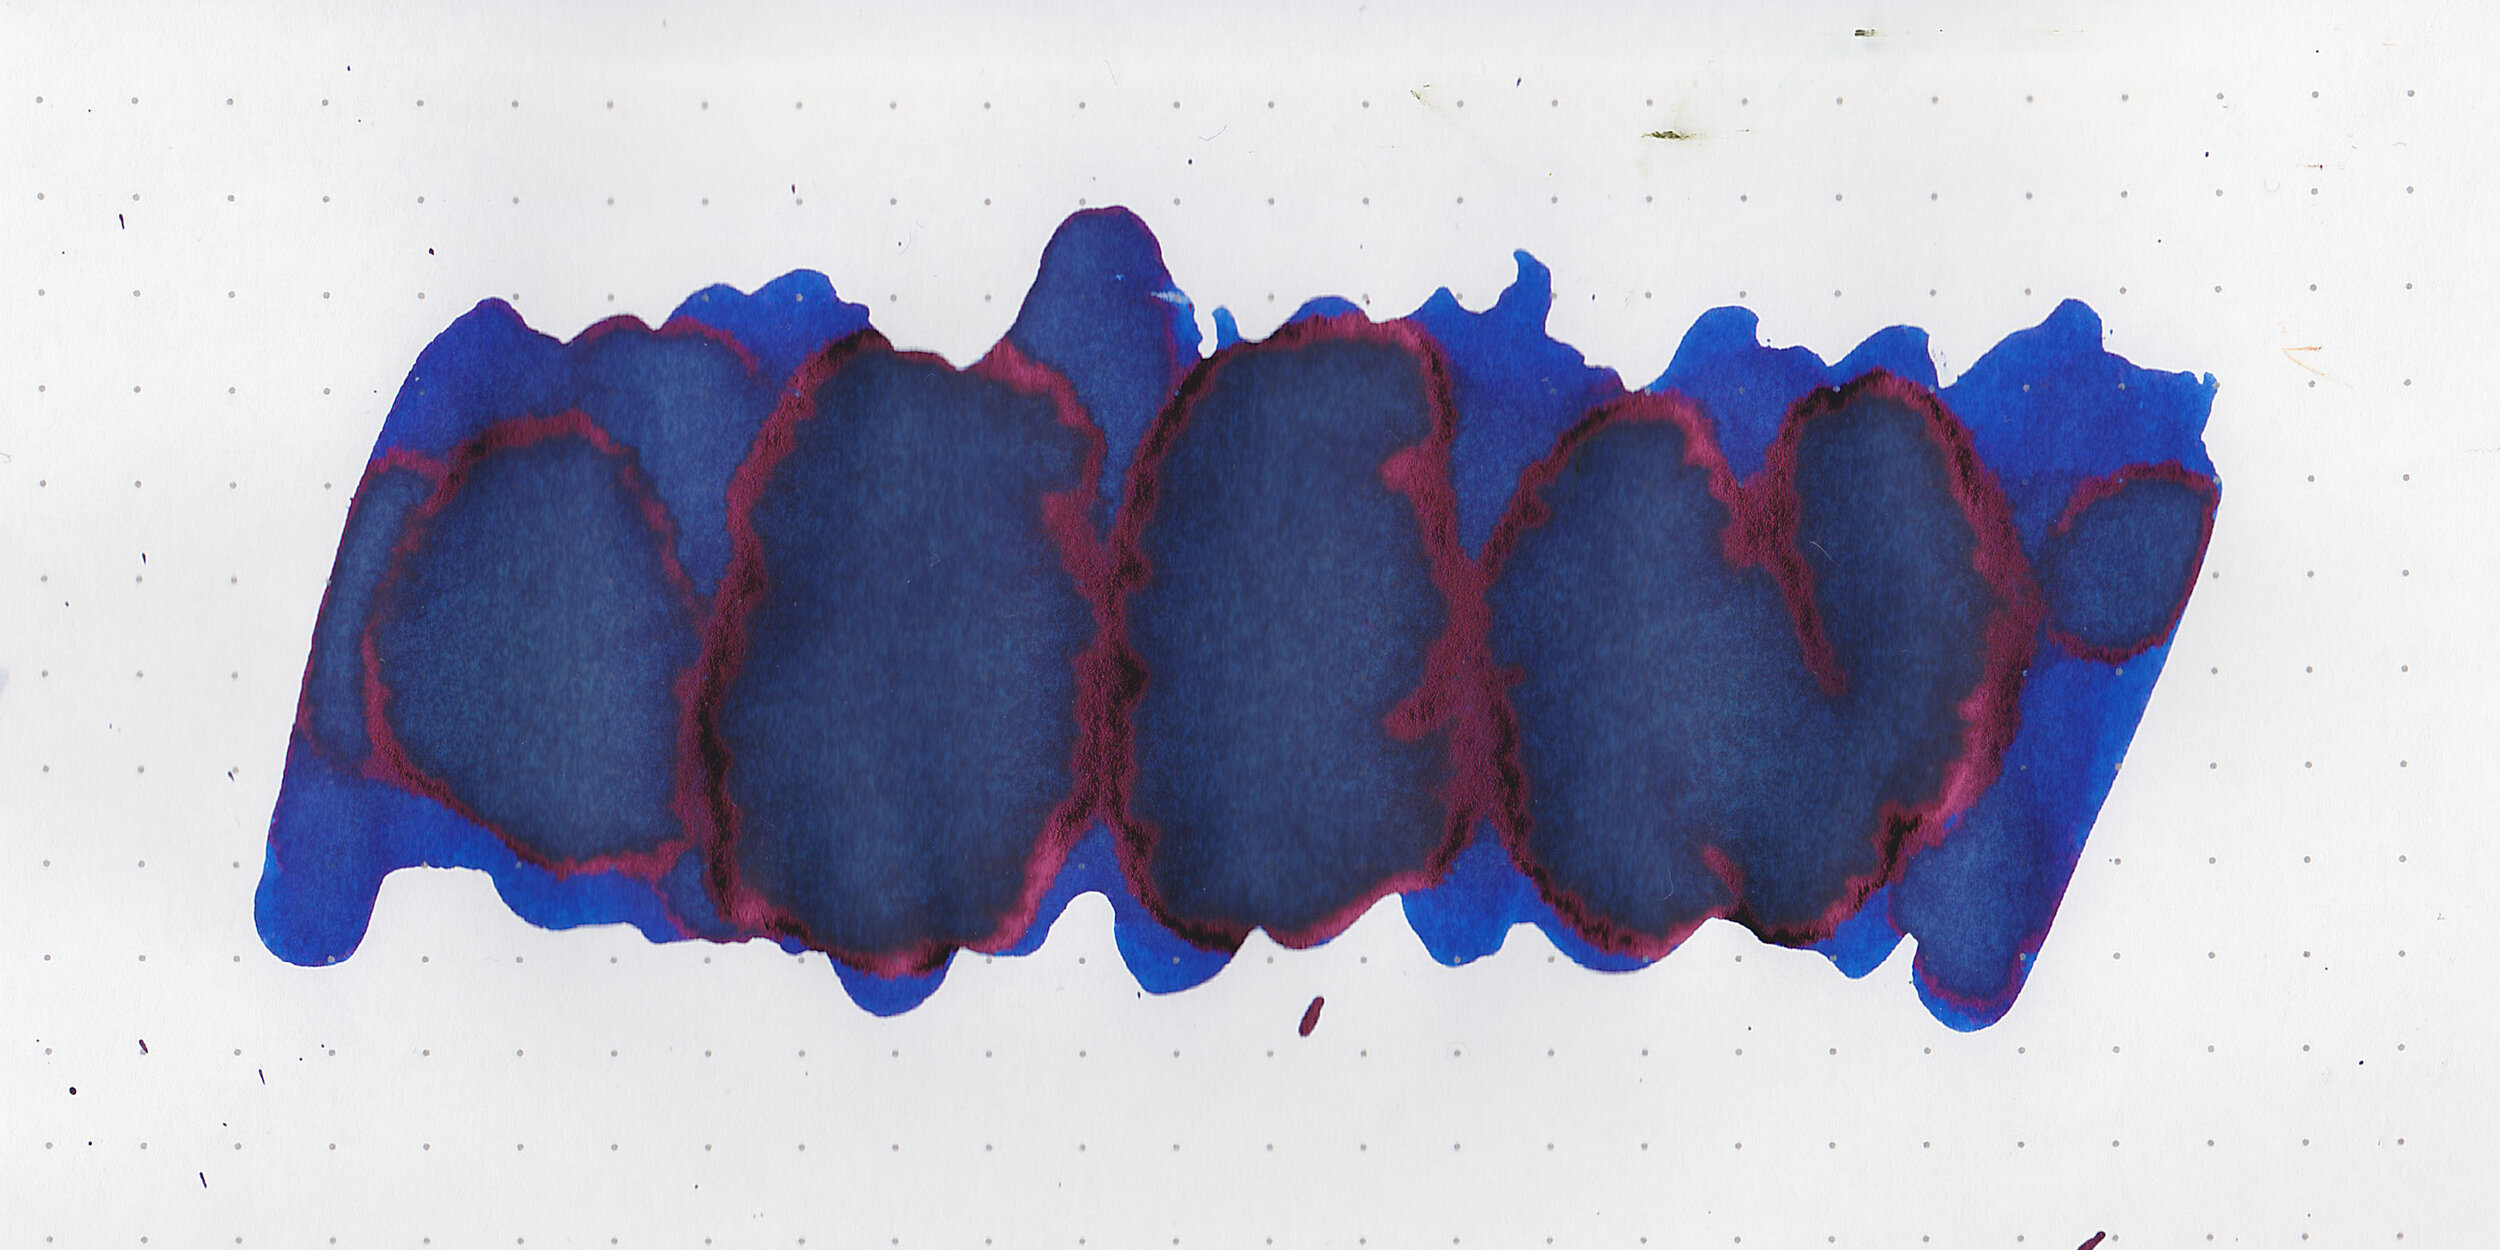 bn-blue-no1-11.jpg